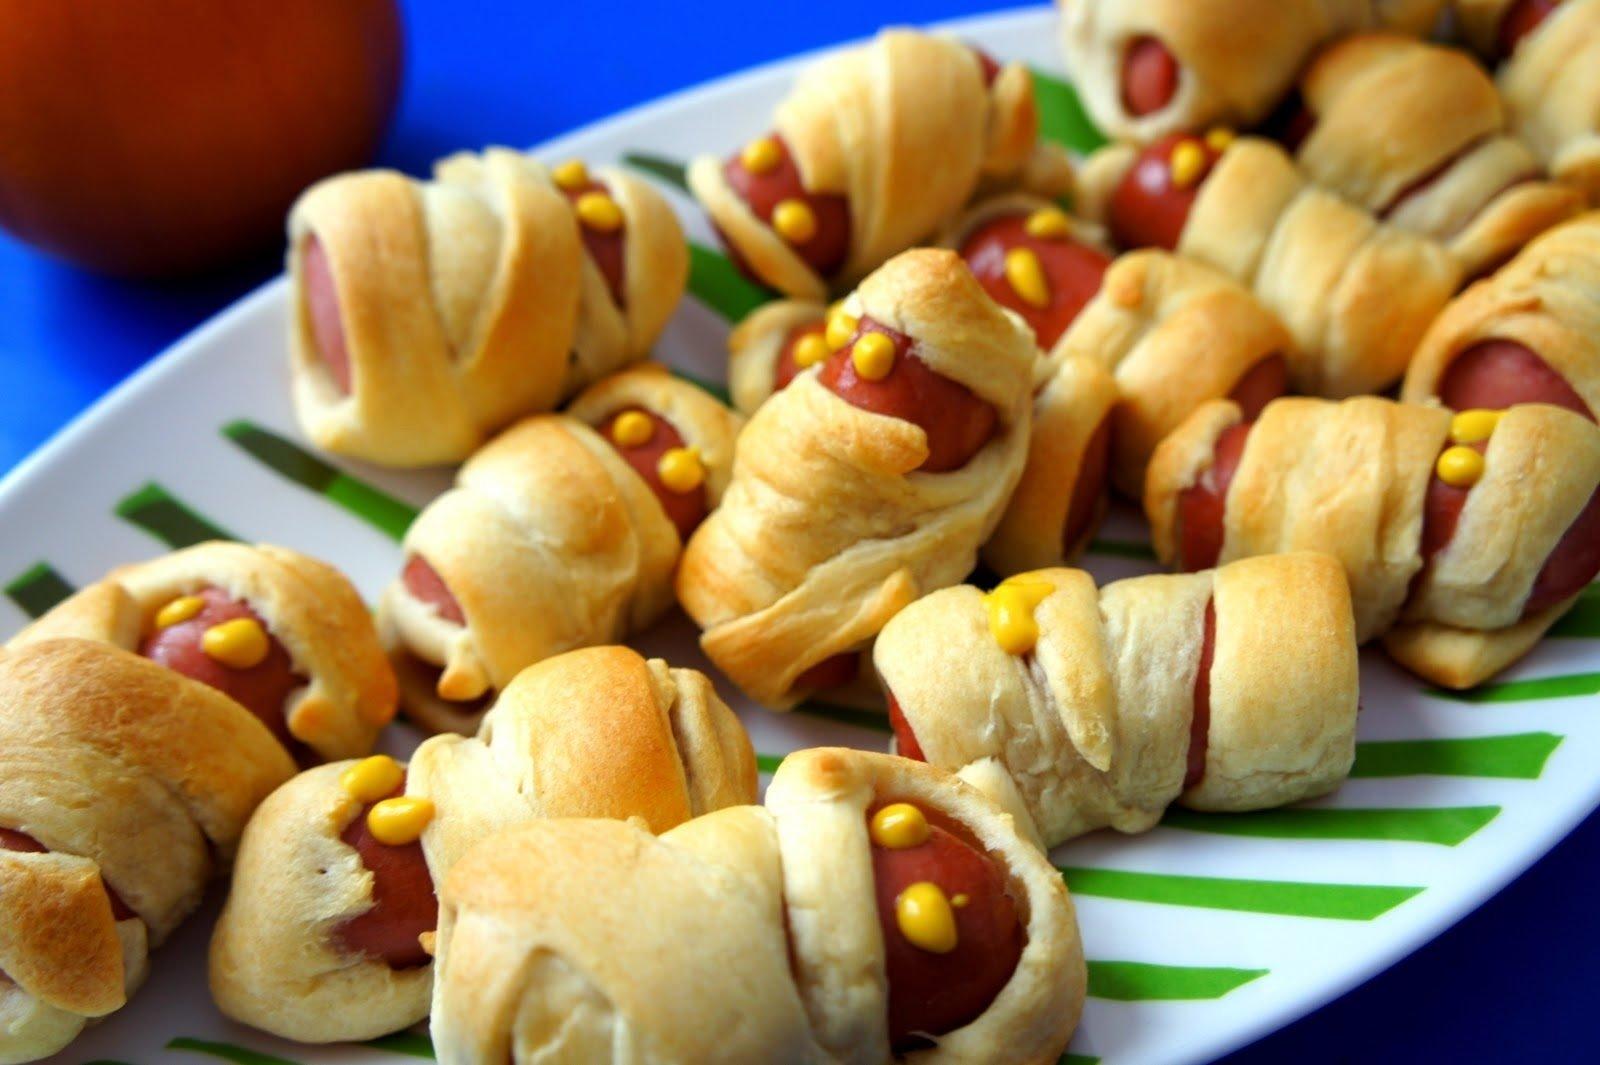 10 Great Kids Halloween Party Food Ideas halloween party food ideas children halloween articles halloween 2020